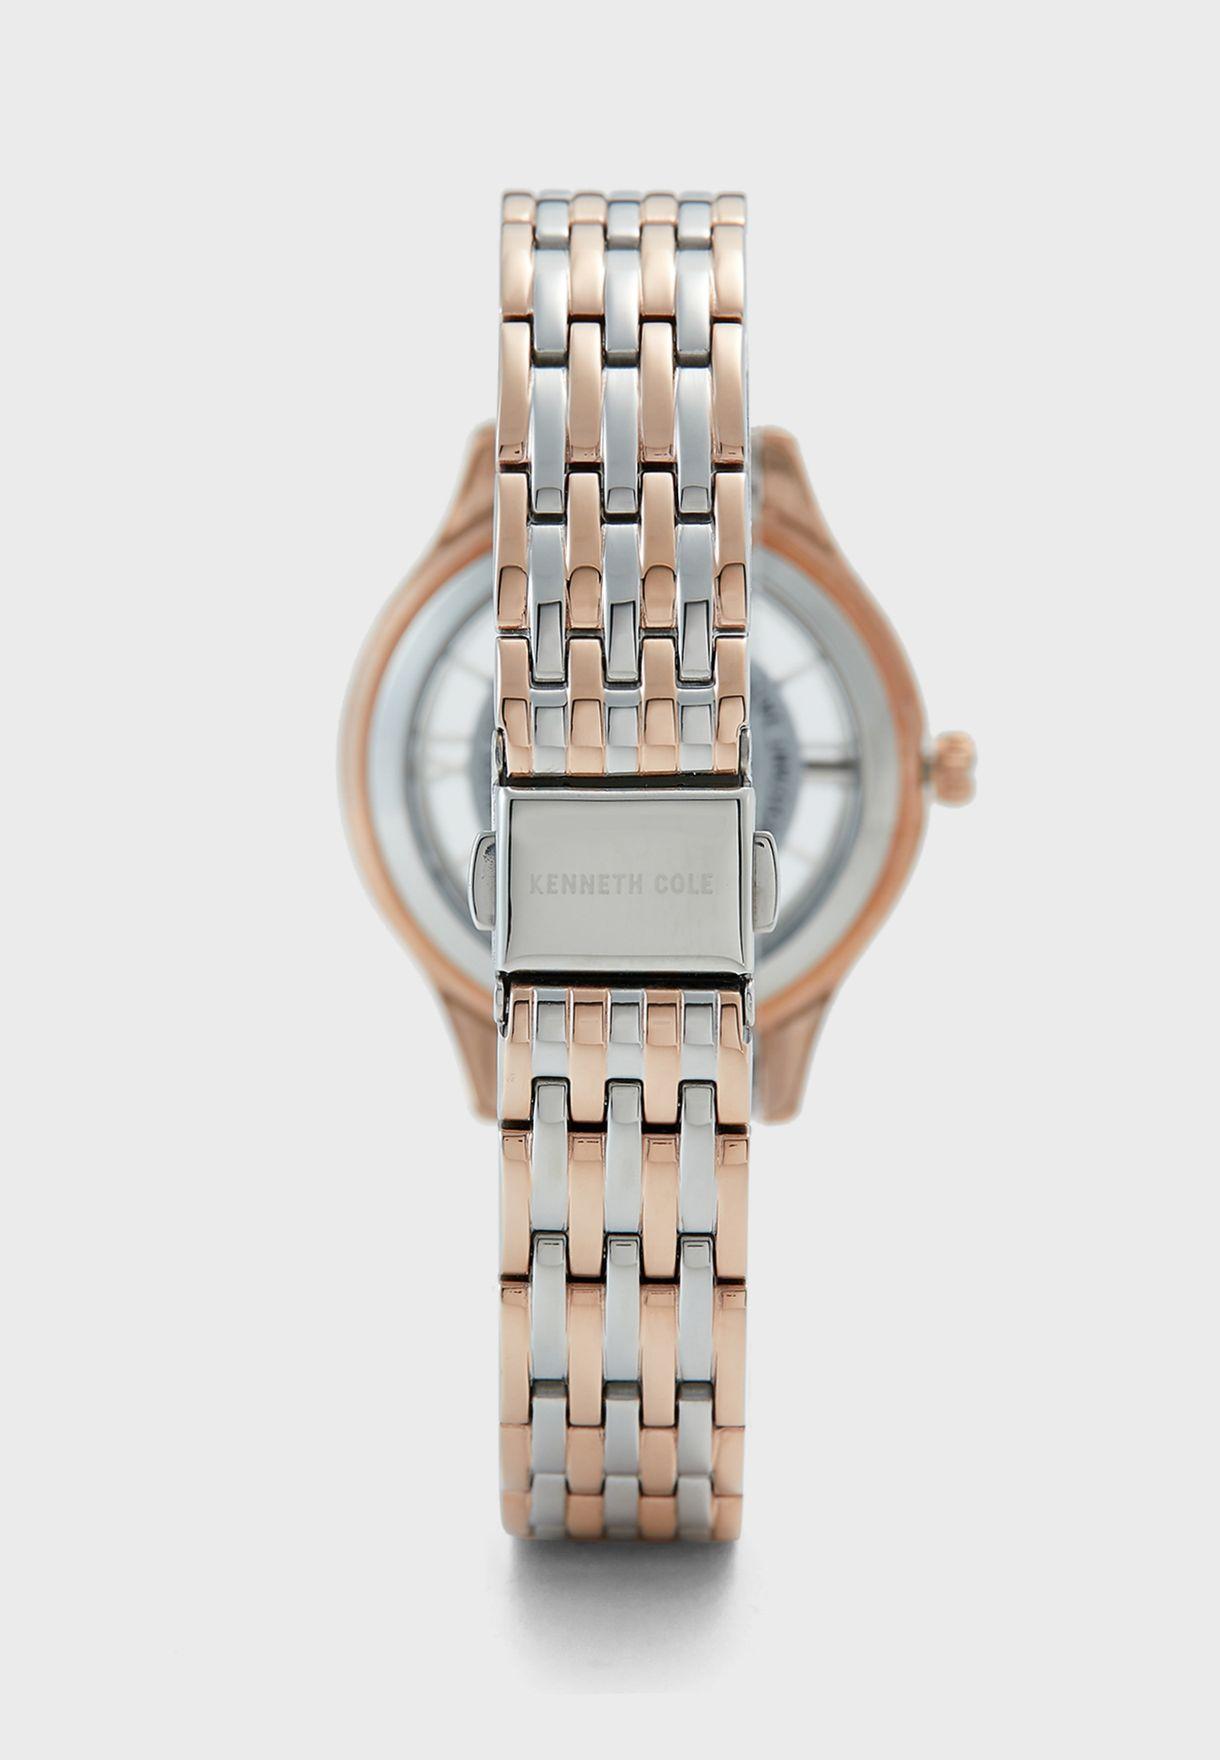 KC51013006 Steel Strap Analog Watch